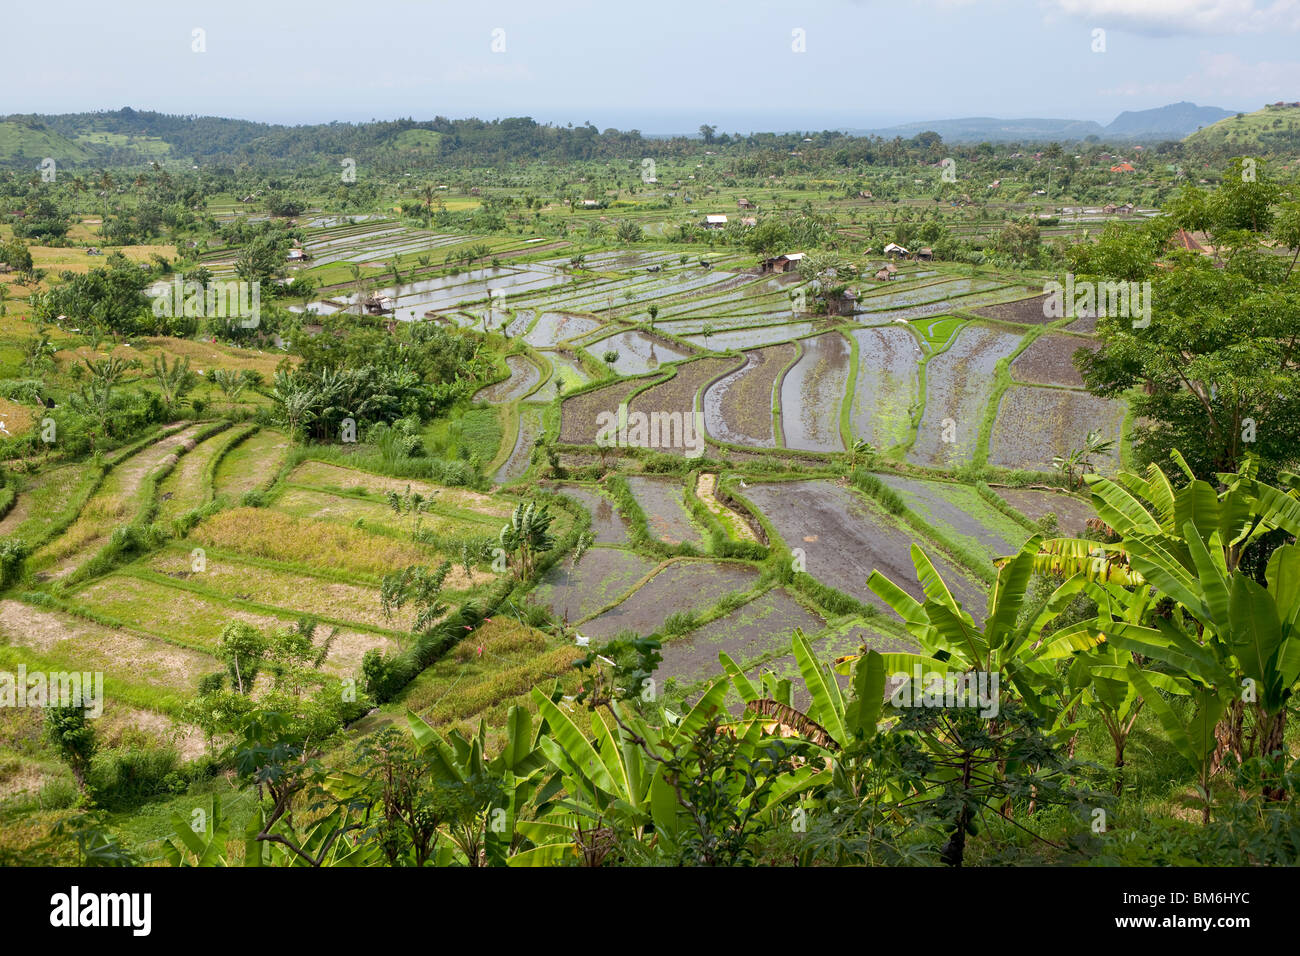 Rice field at Tirta Gangga Bali Indonesia - Stock Image